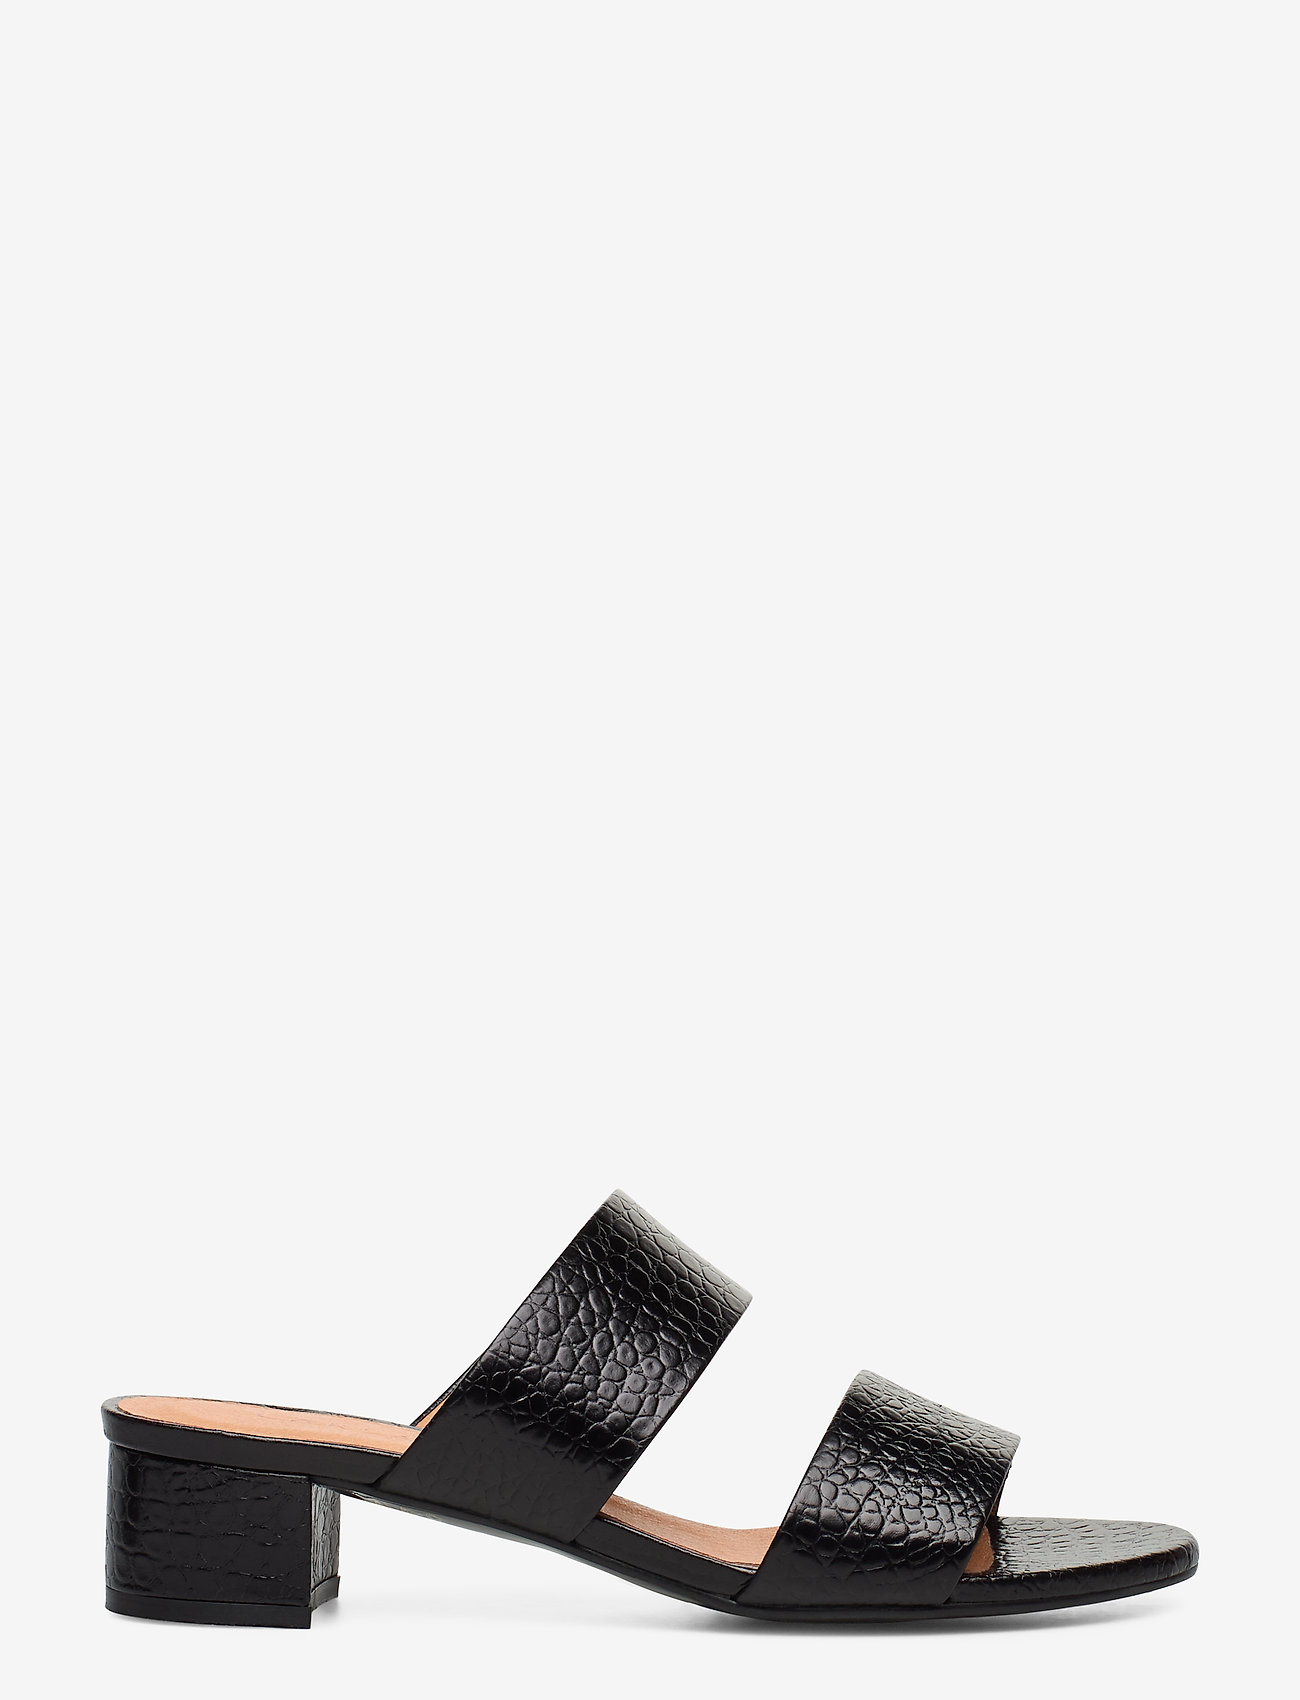 Carla F - SANDALS - mules & slipins - black yango 10 - 1